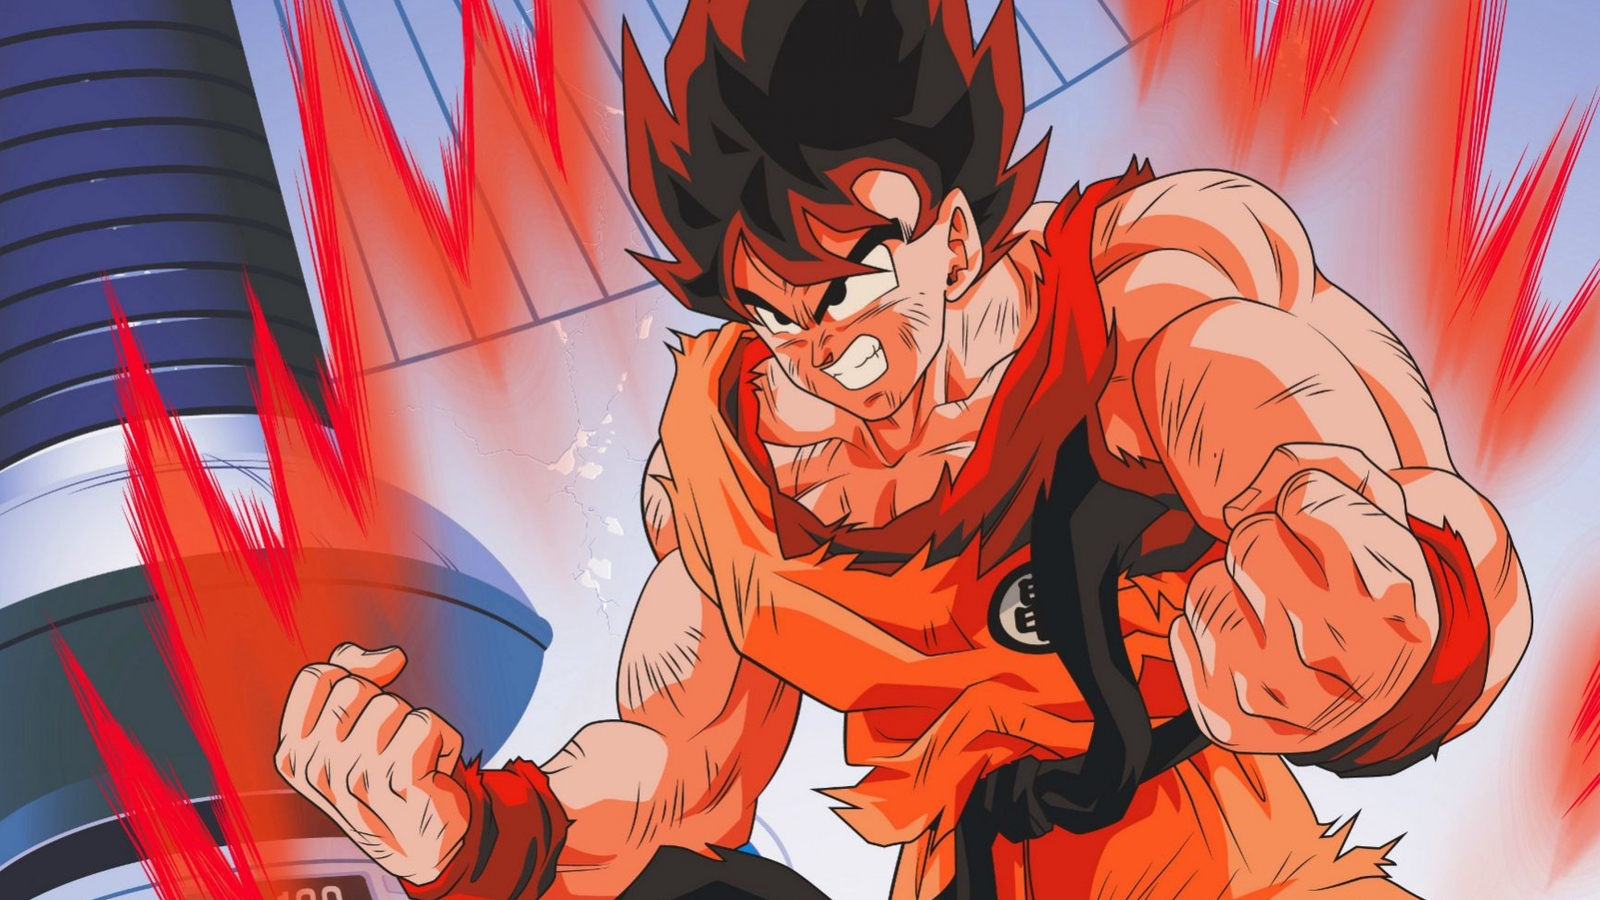 1600x900 Goku Dragon Ball Z 4k 1600x900 Resolution HD 4k ...